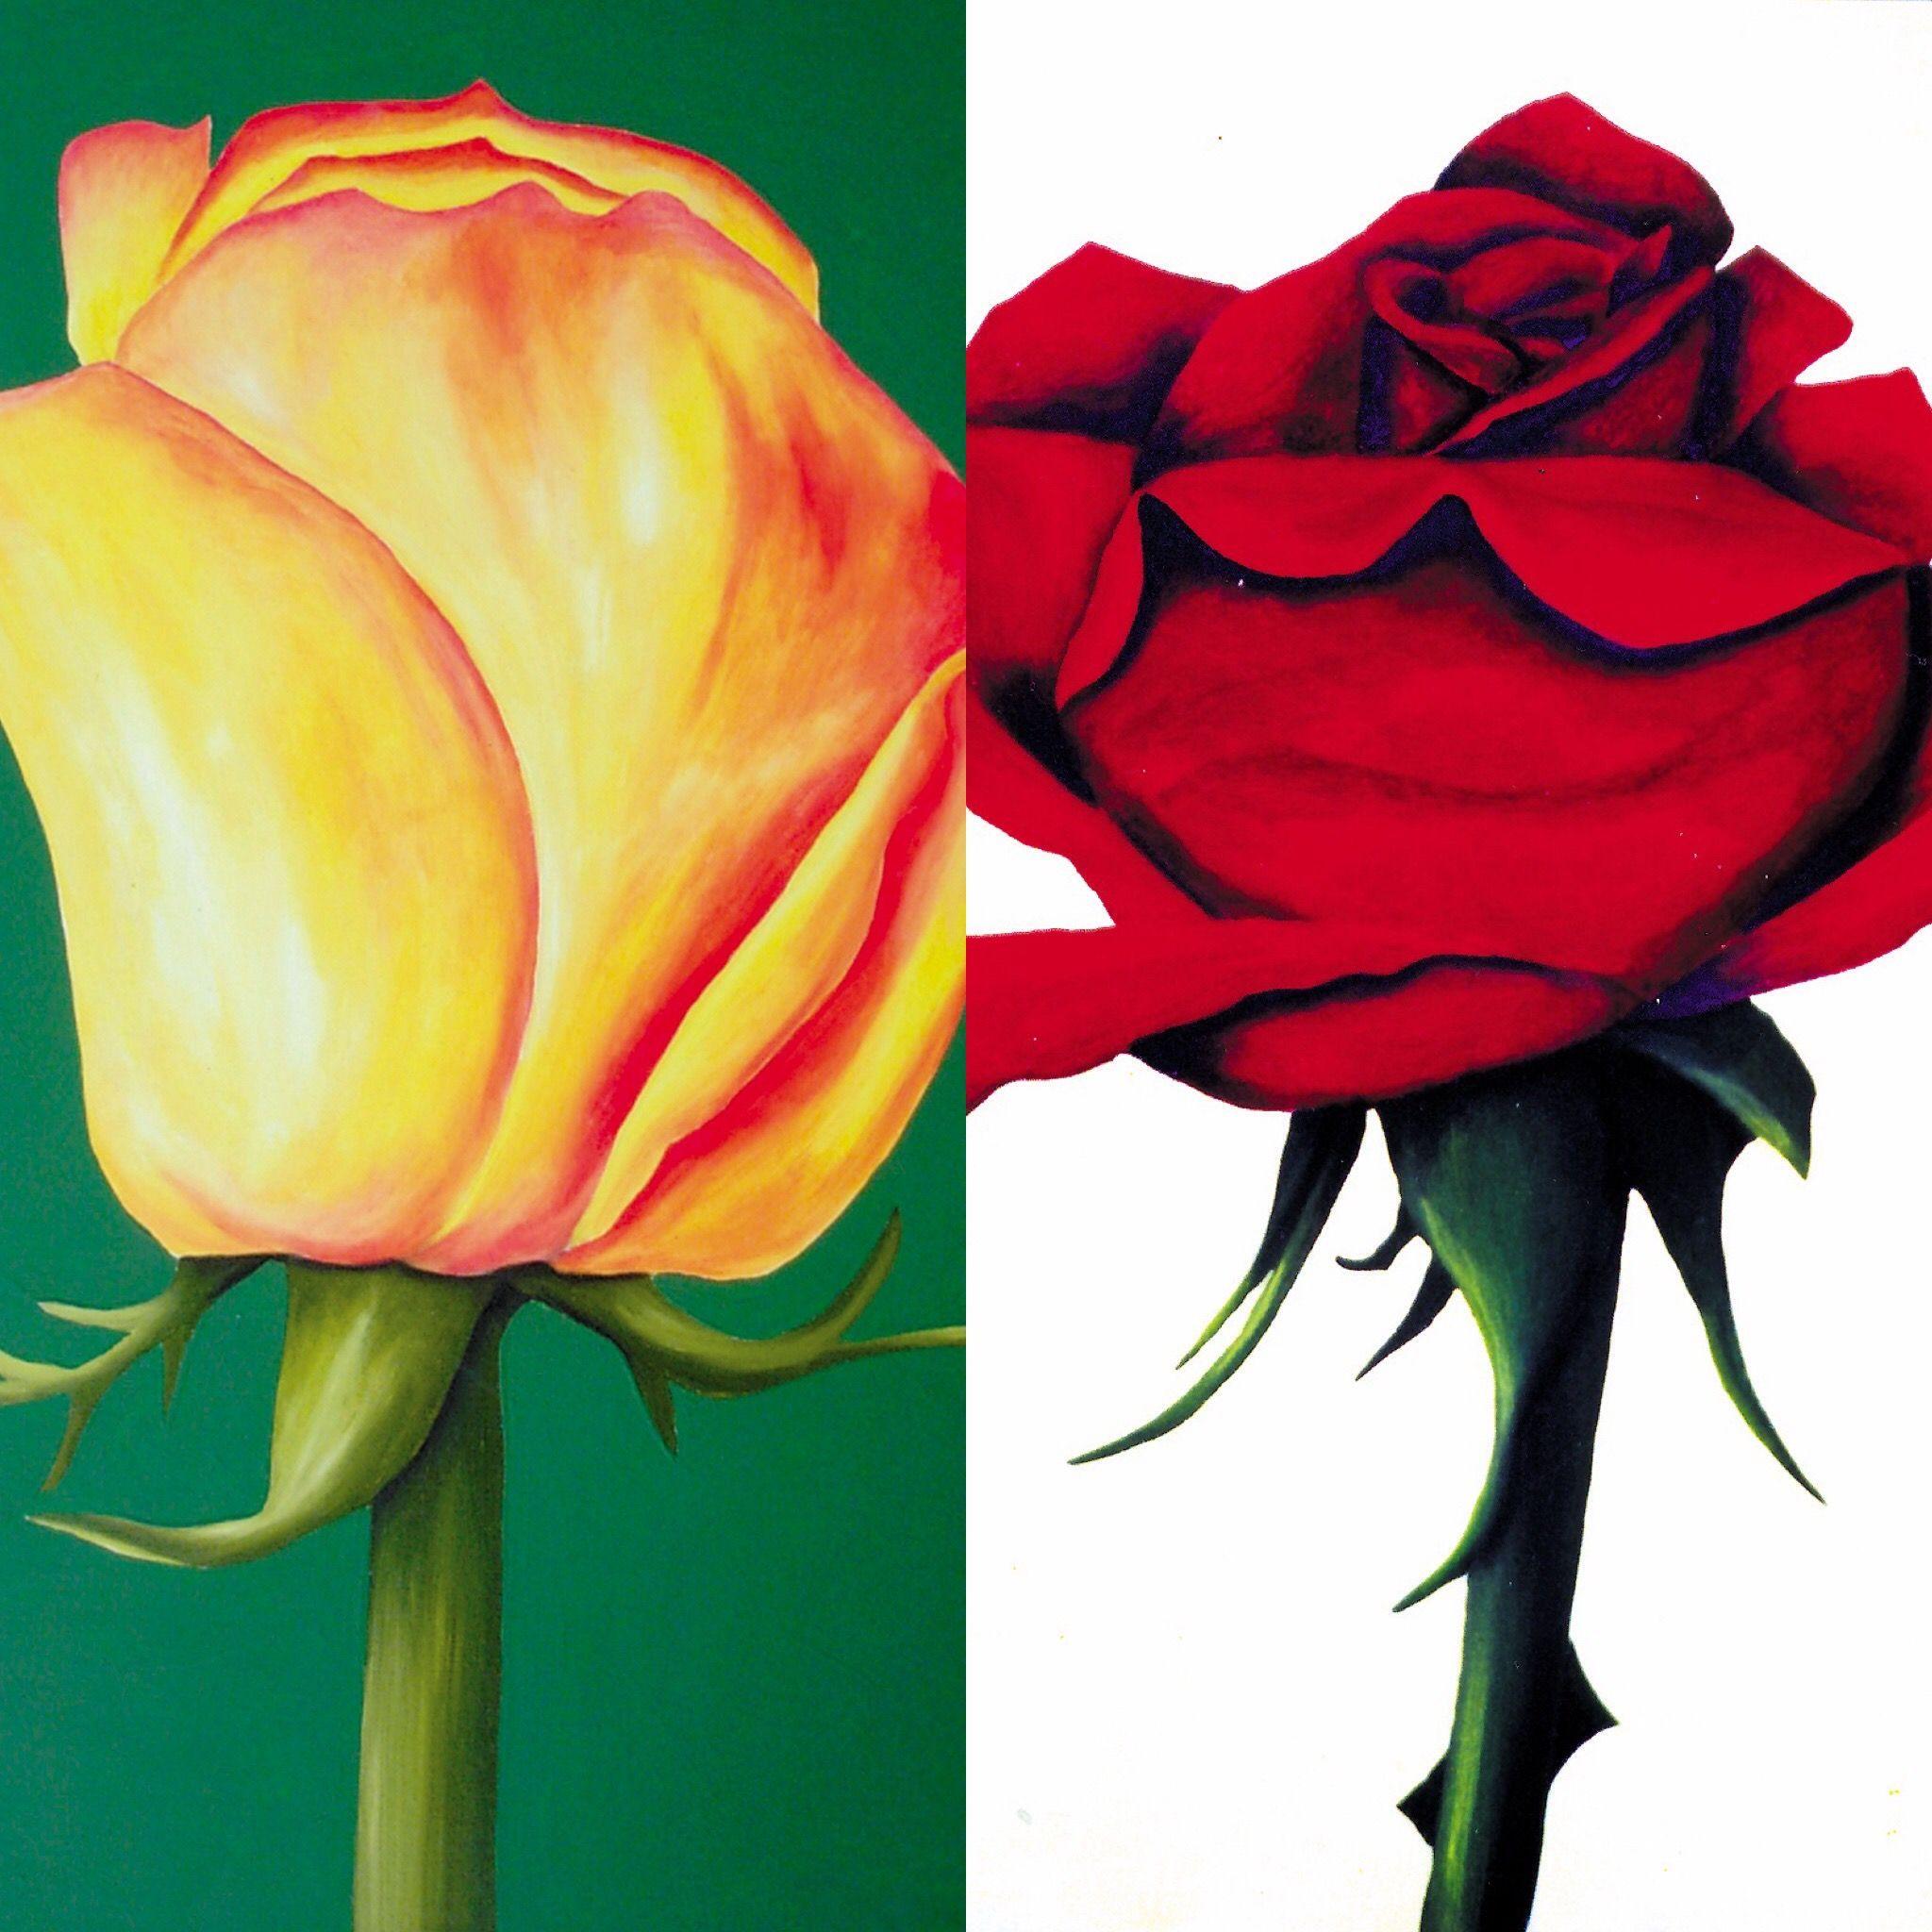 Rosen II -Acryl auf Leinwand- je 50 x 70 cm